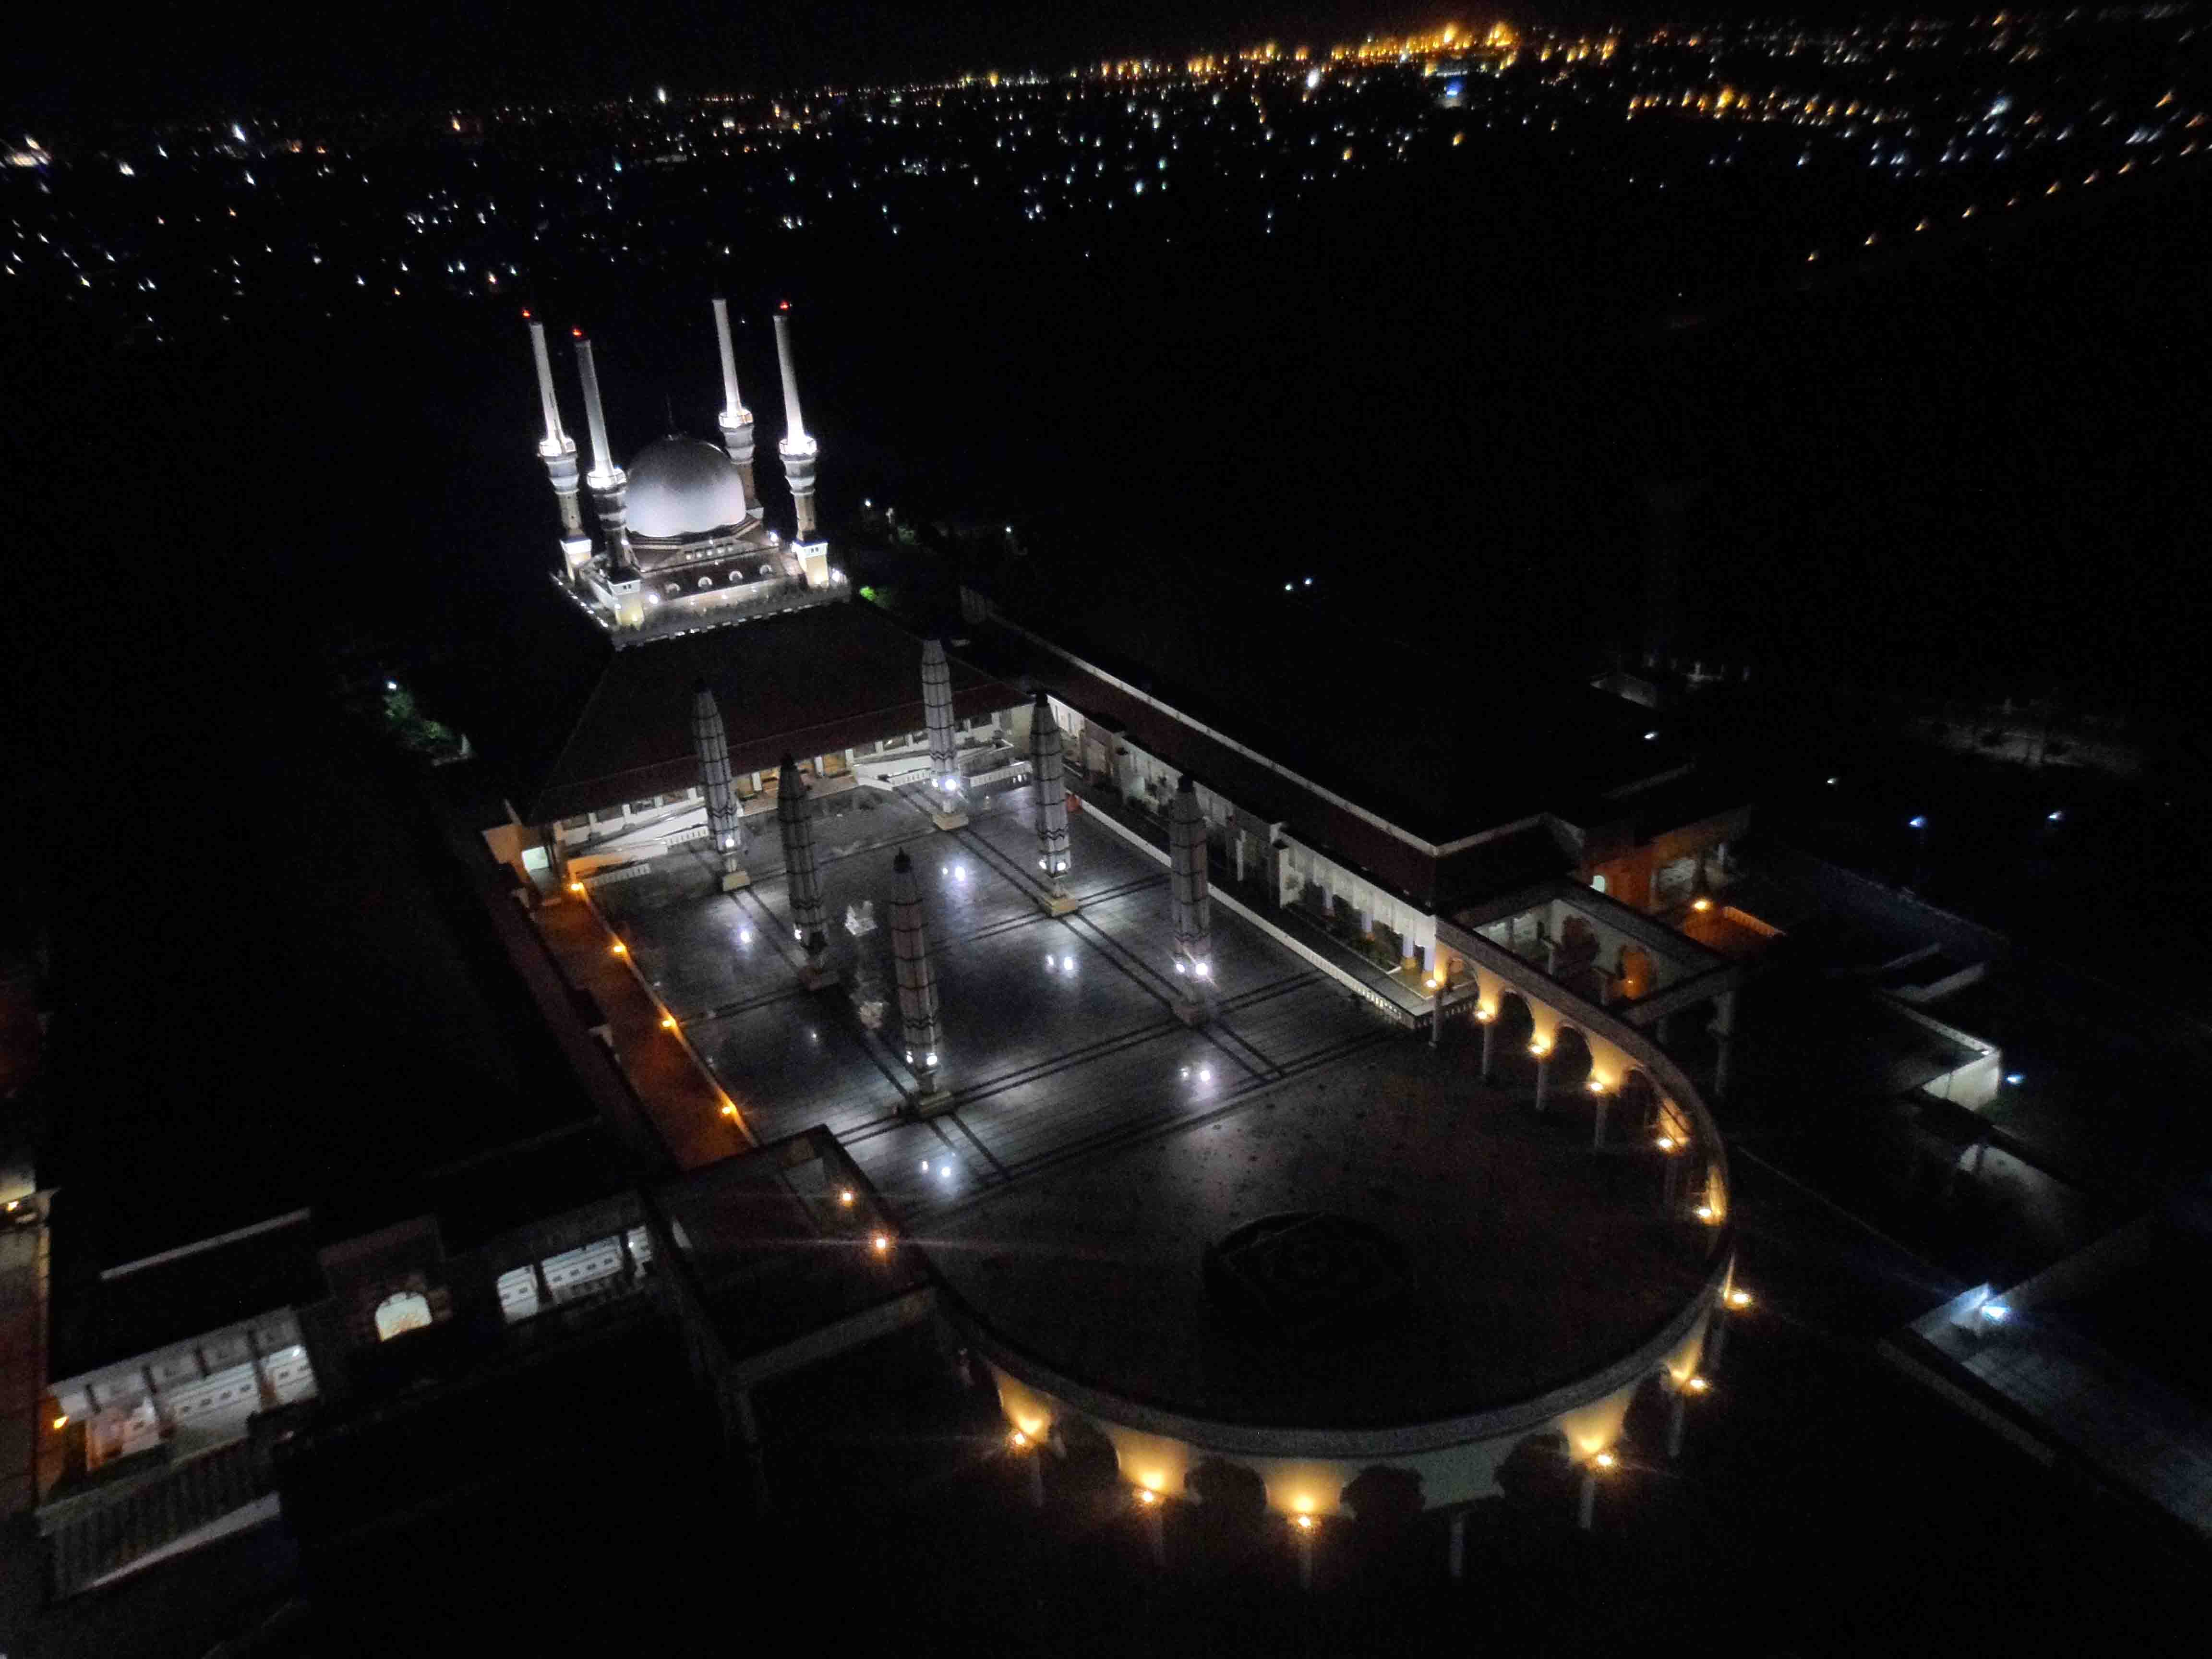 Potret Mesjid Agung Jawa Tengah pada malam hari.